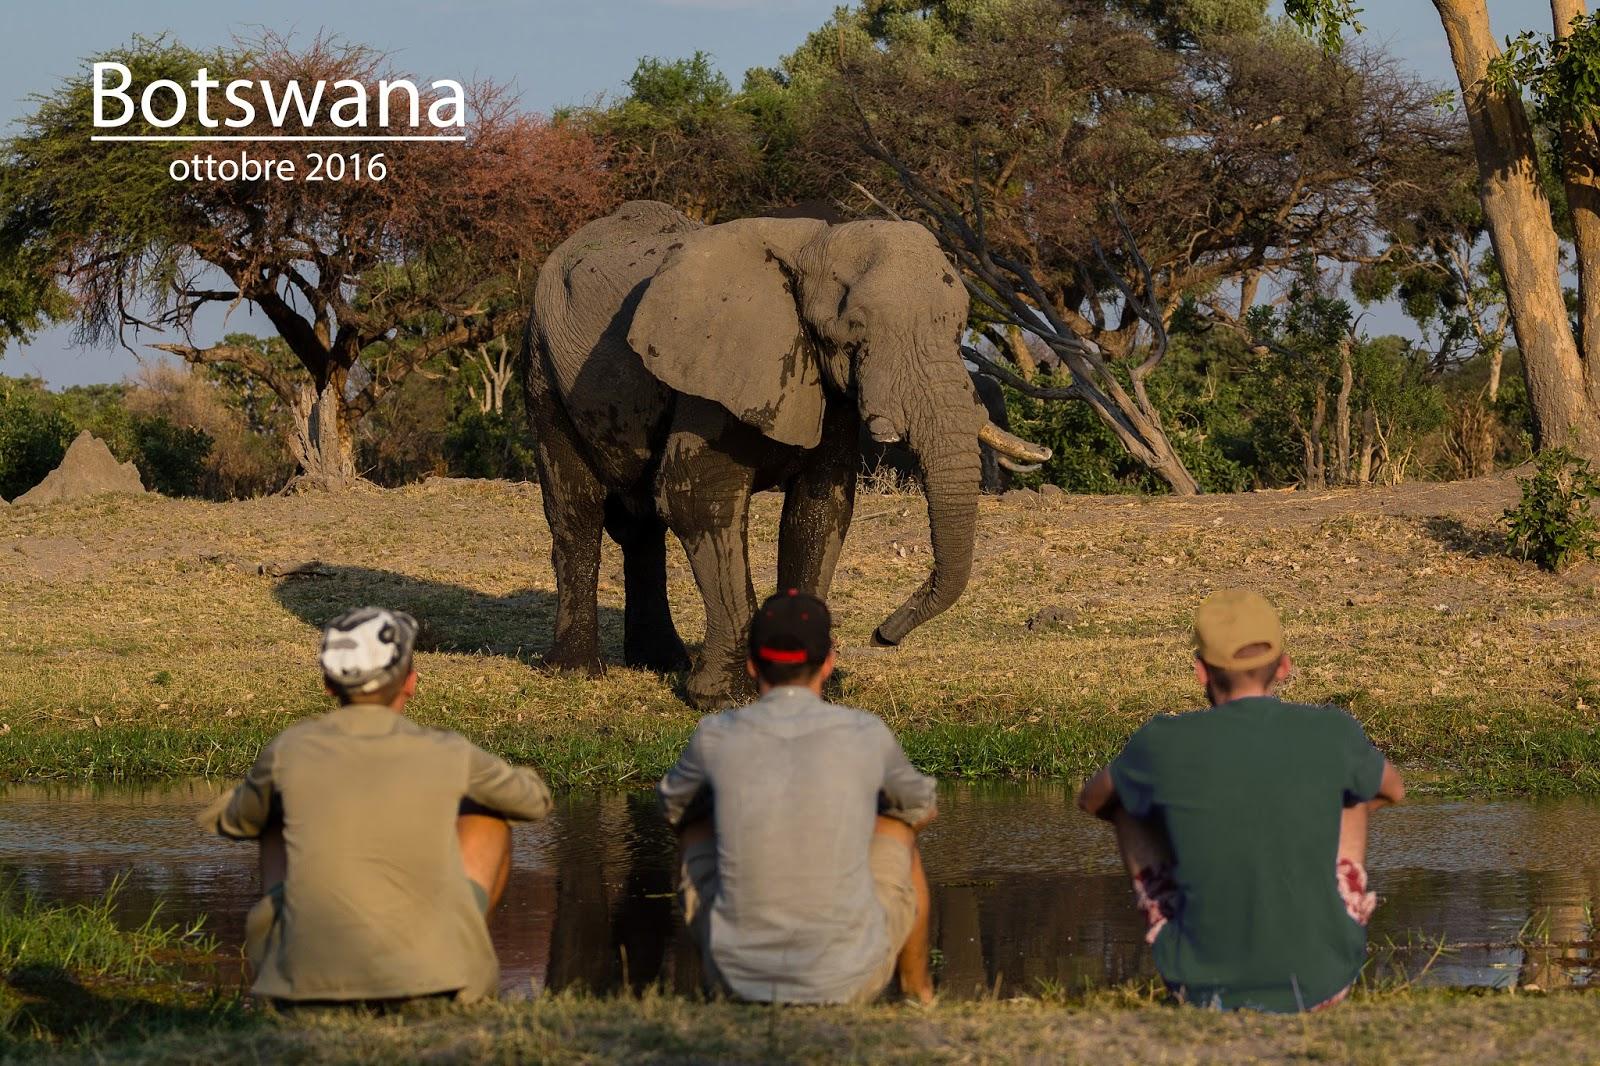 Botswana incontri